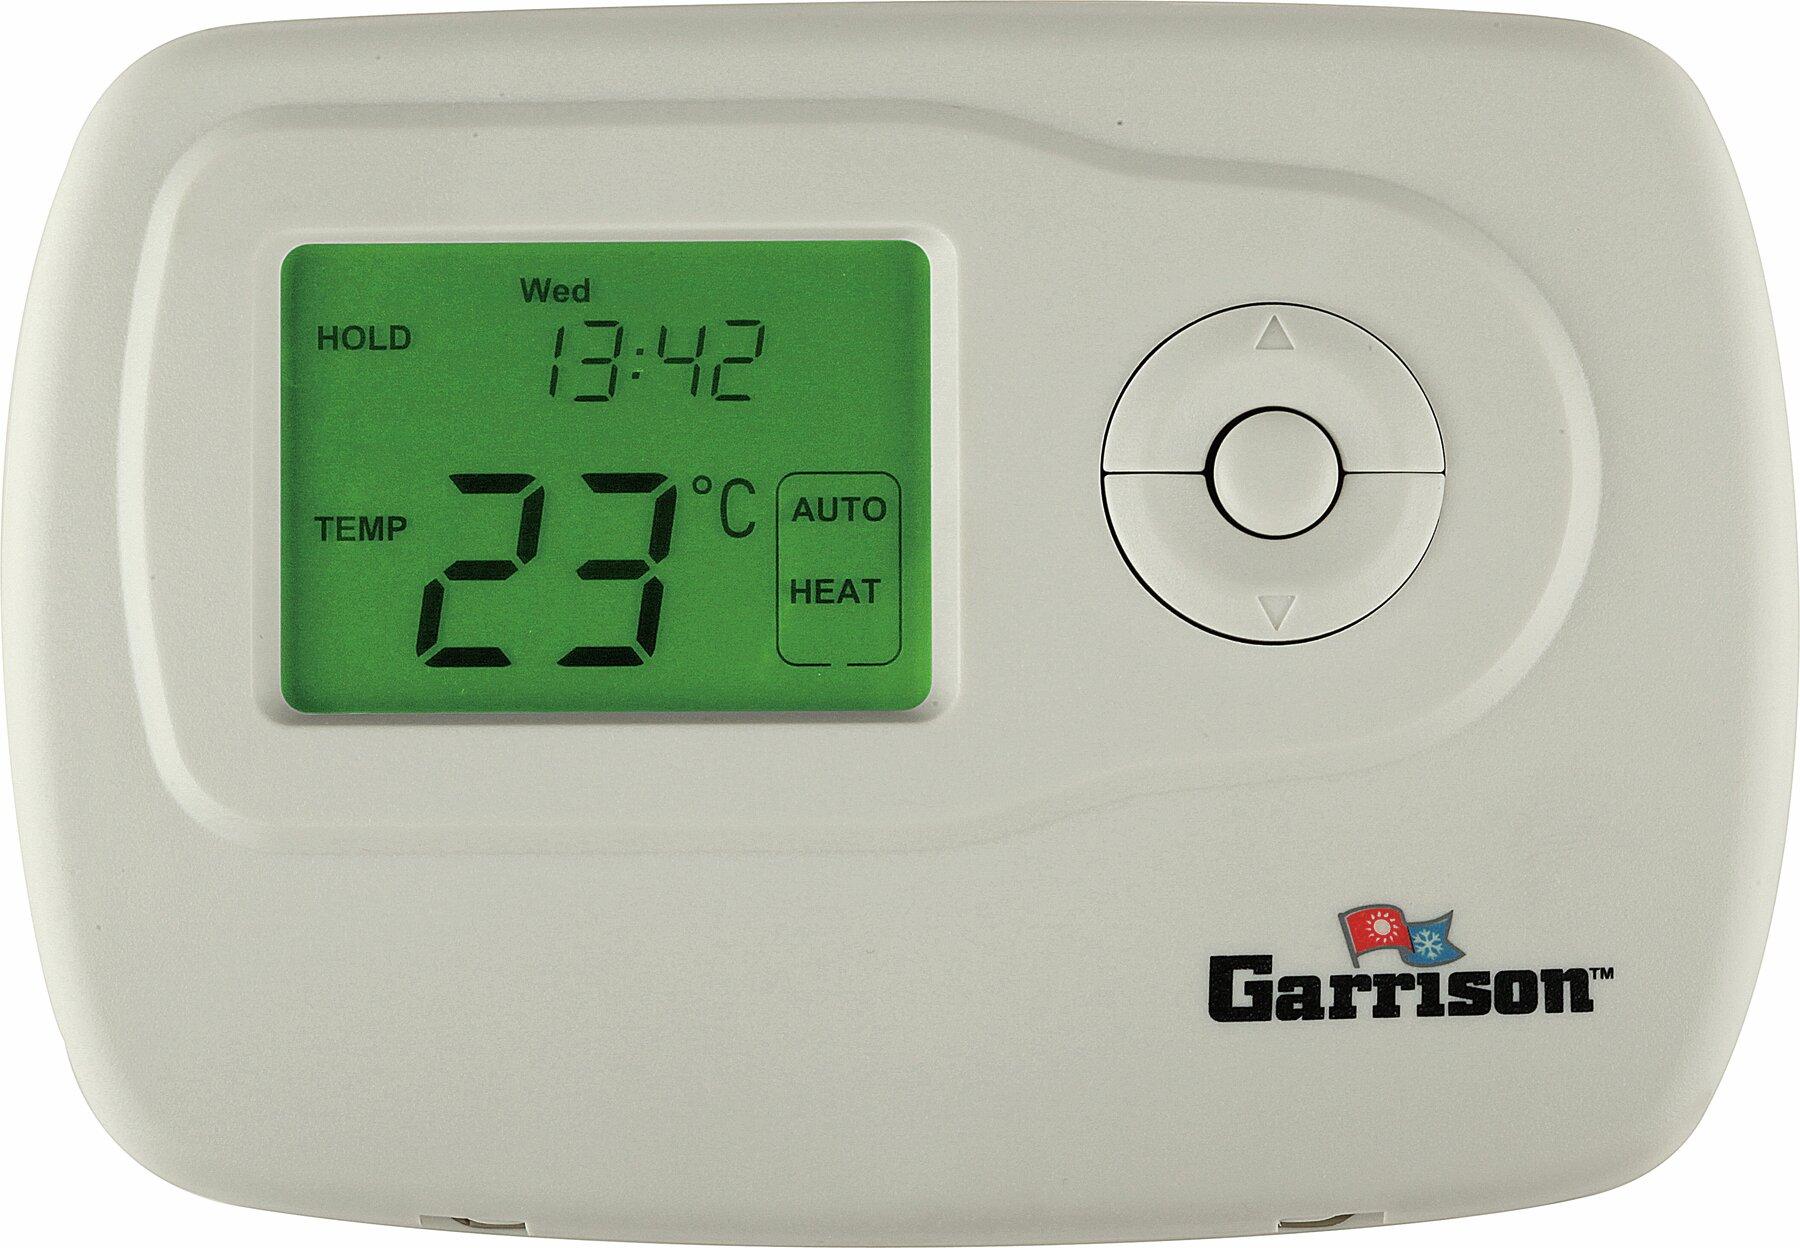 garrison garrison digital thermostat wayfair rh wayfair com Electric Baseboard Heaters 220 Volt Wiring with Romex Wiring 2 Baseboard Heaters to 1 Thermostat